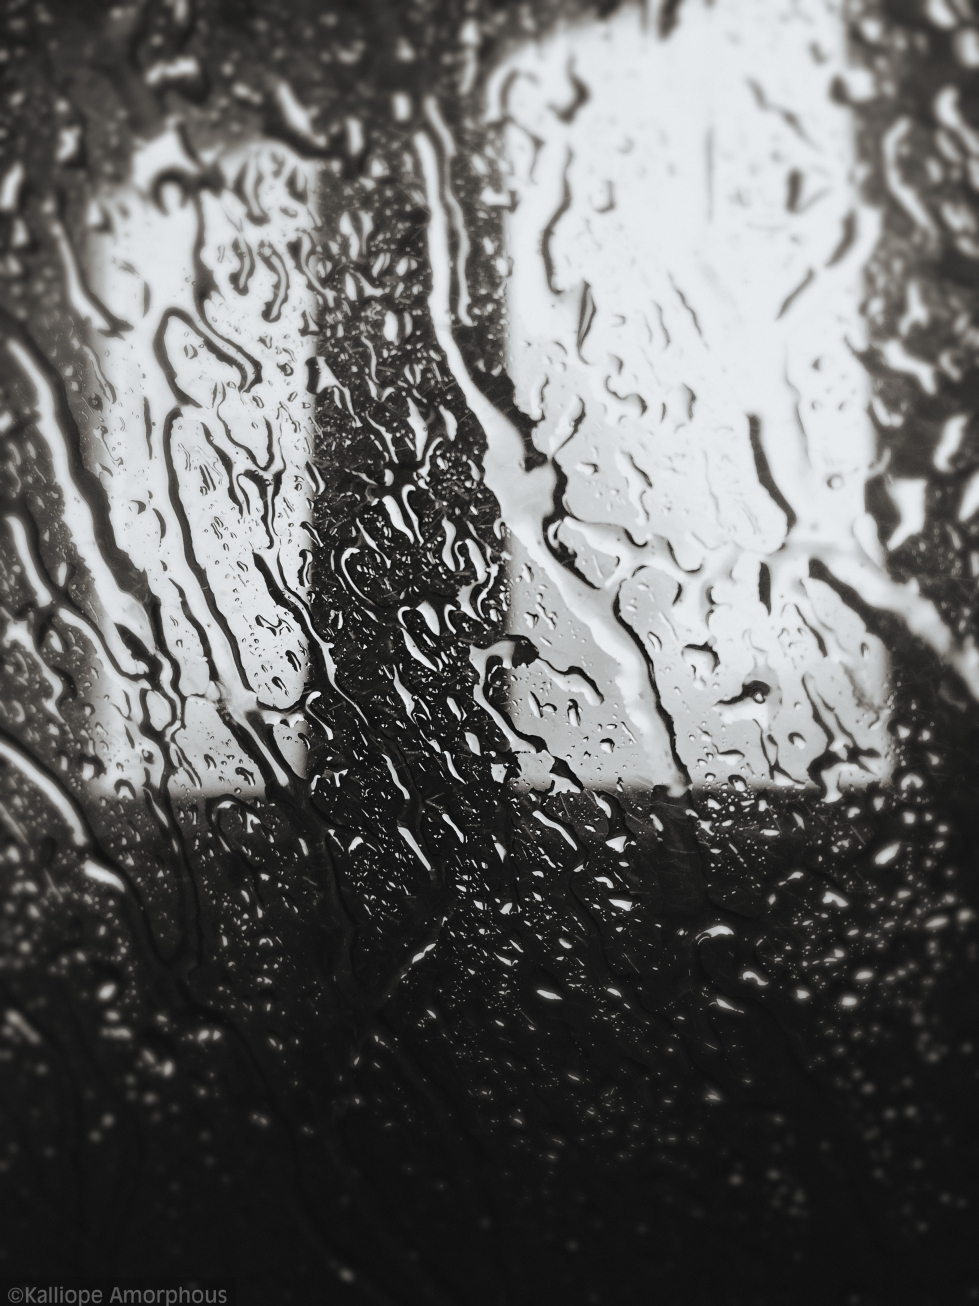 rainy night nyc